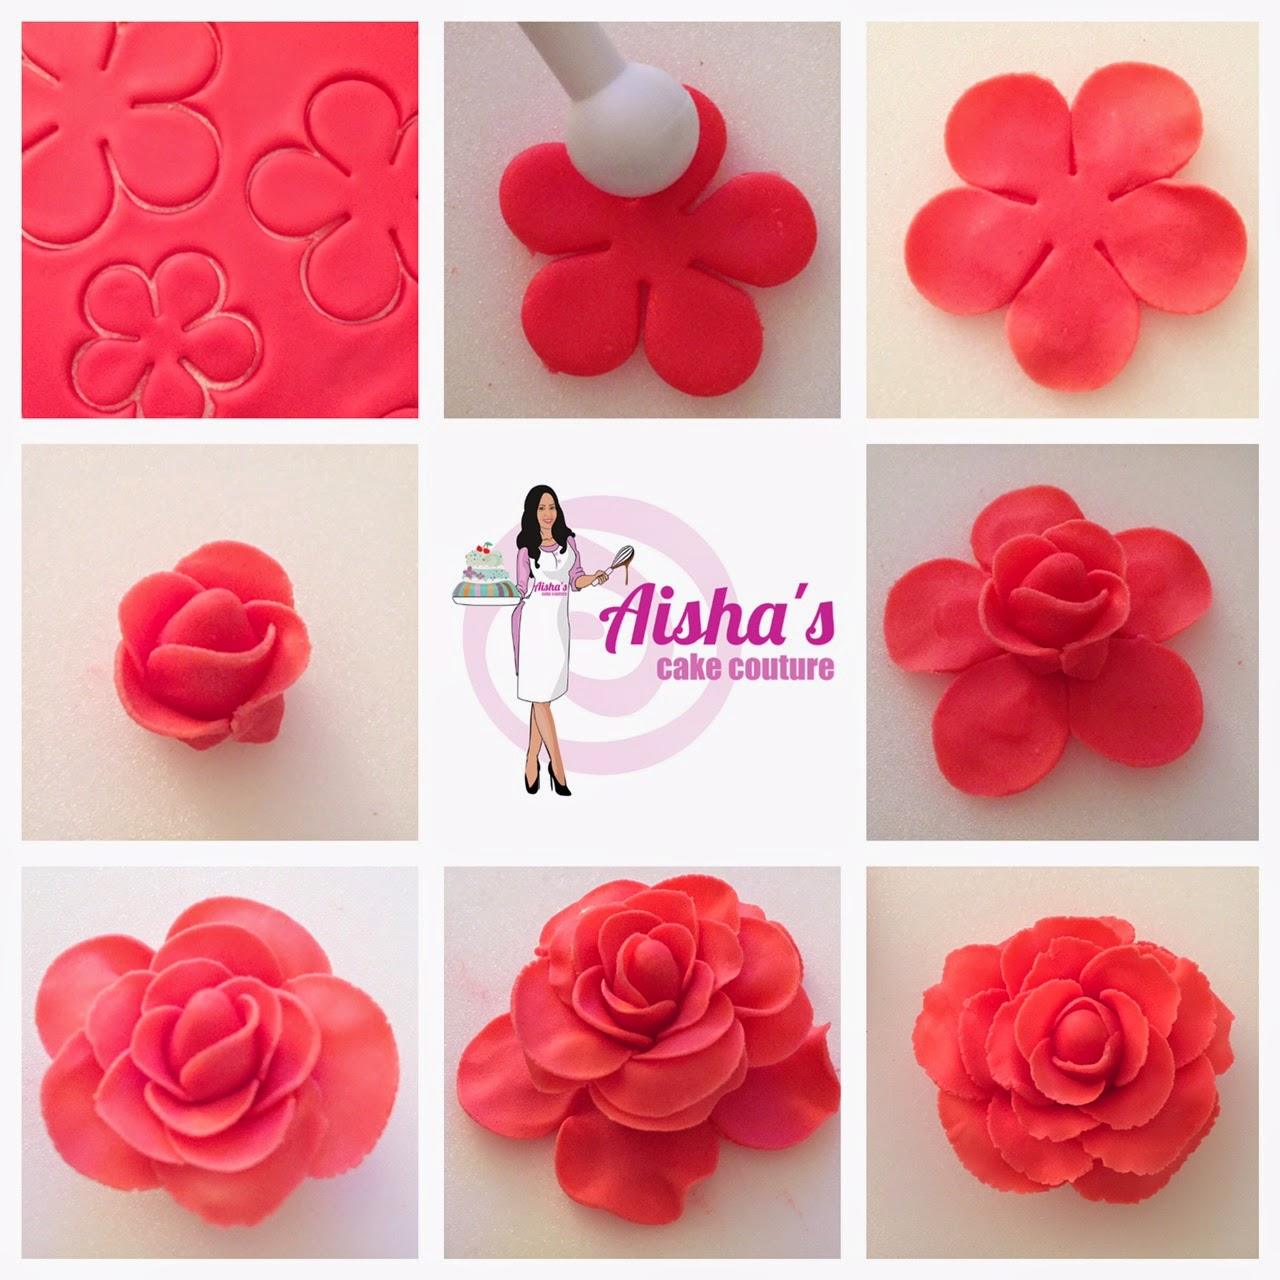 aisha 39 s cake couture. Black Bedroom Furniture Sets. Home Design Ideas